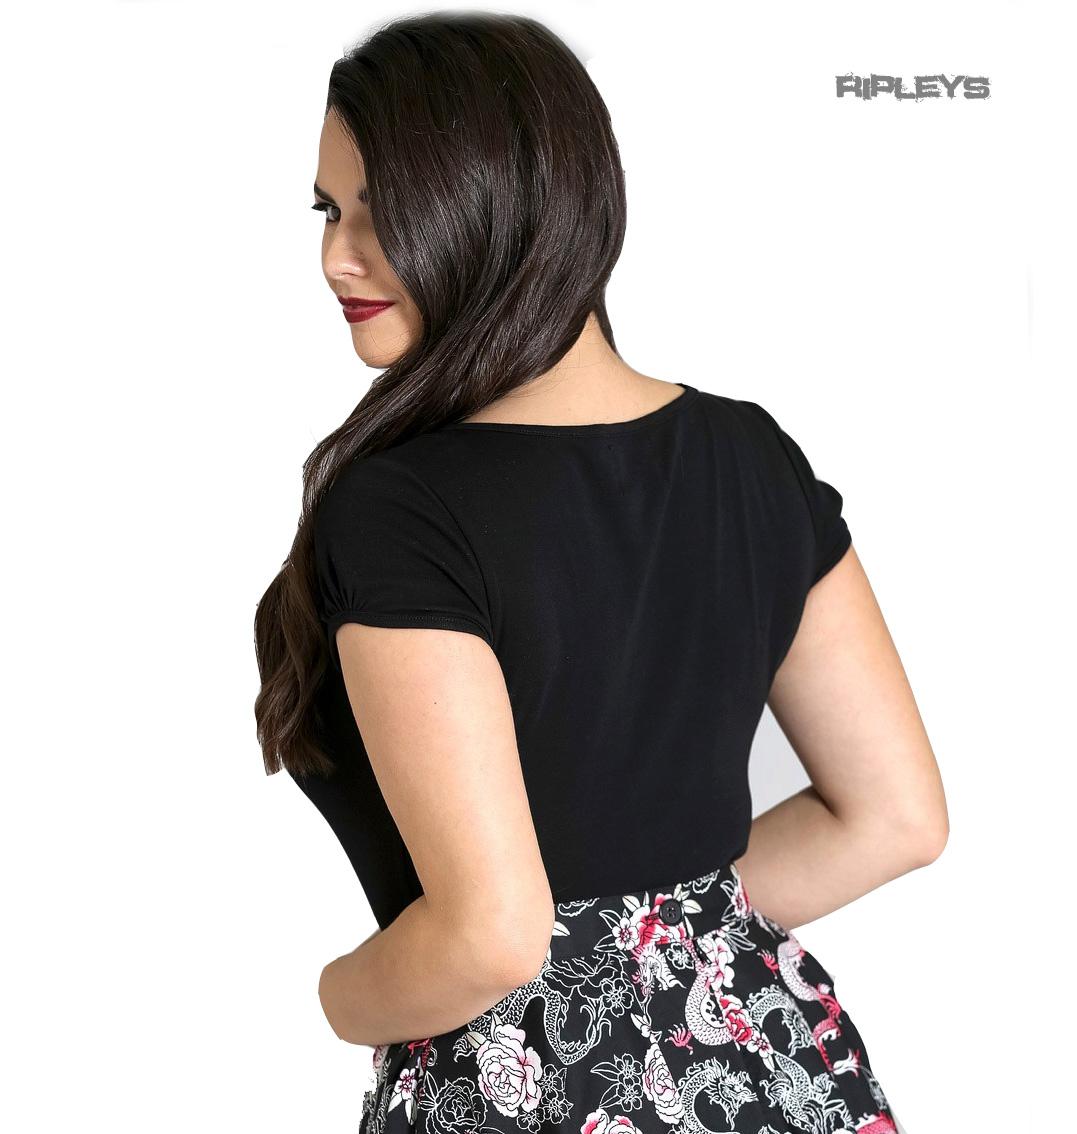 Hell-Bunny-Shirt-50s-Rockabilly-Top-MIA-Plain-Black-Short-Sleeves-All-Sizes thumbnail 40